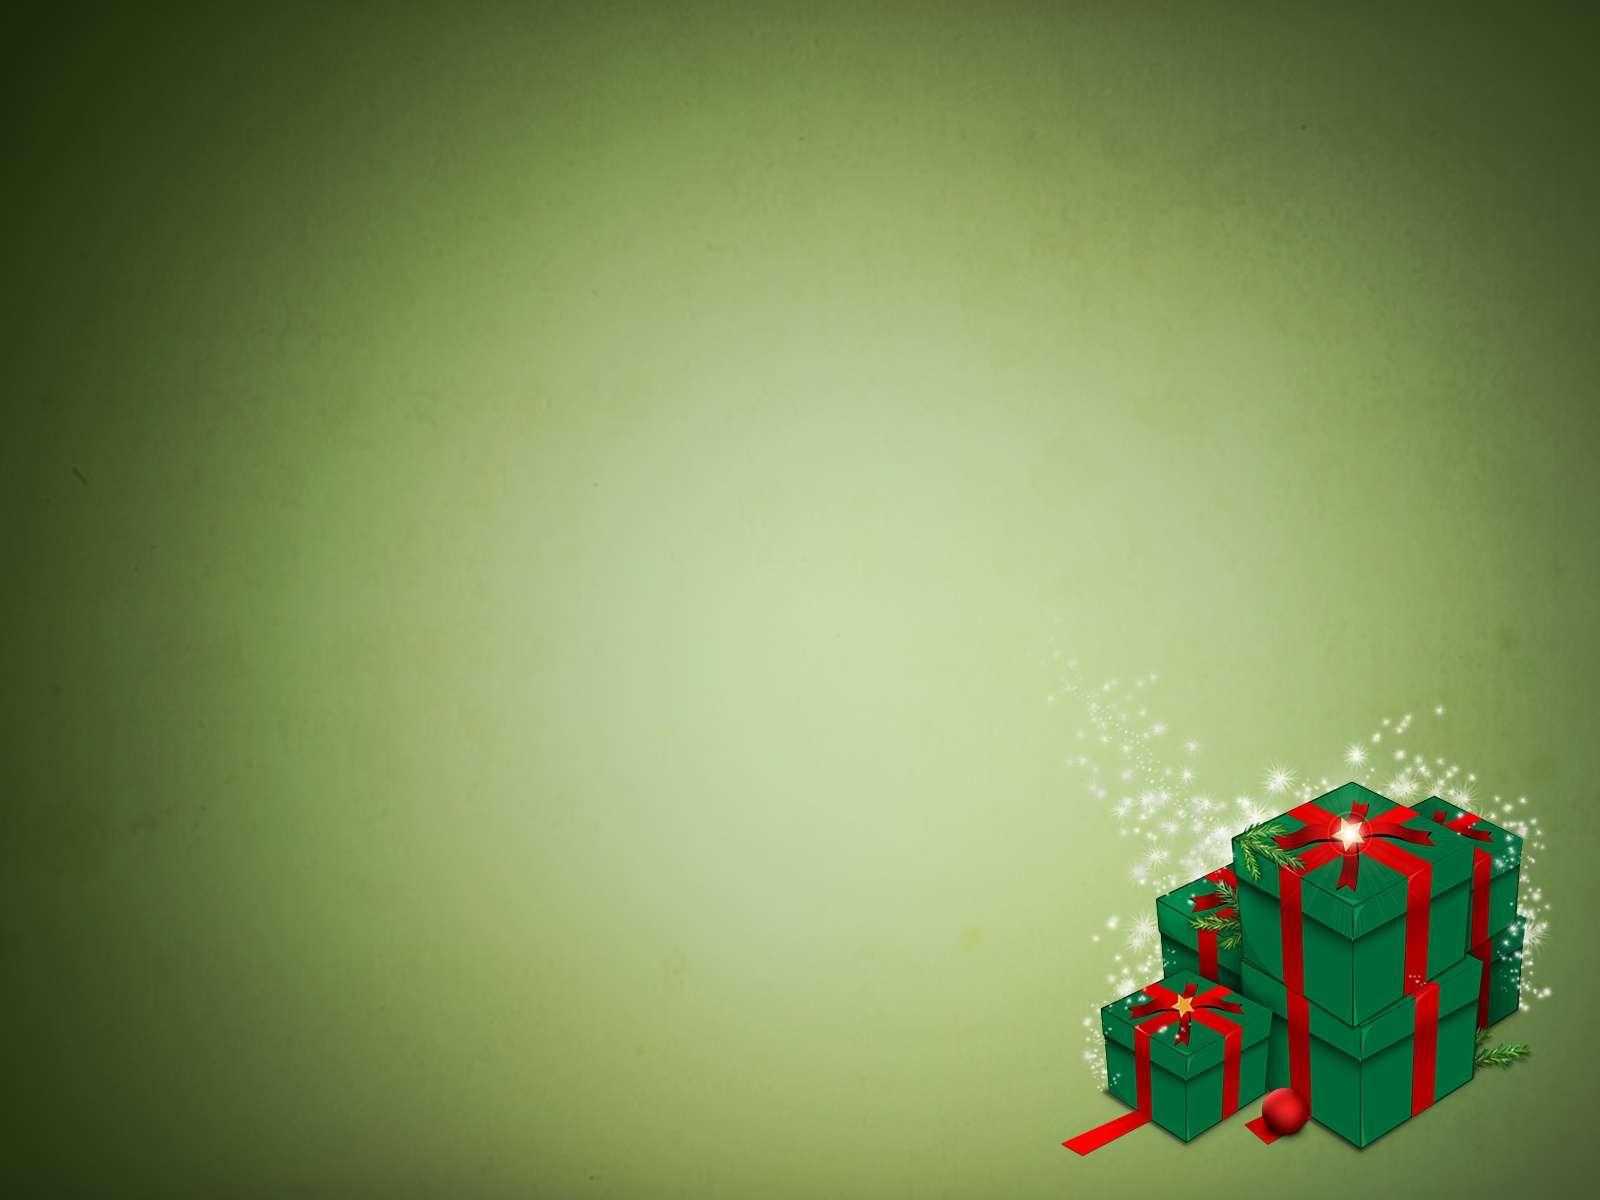 Christmas Winter Wallpaper 051